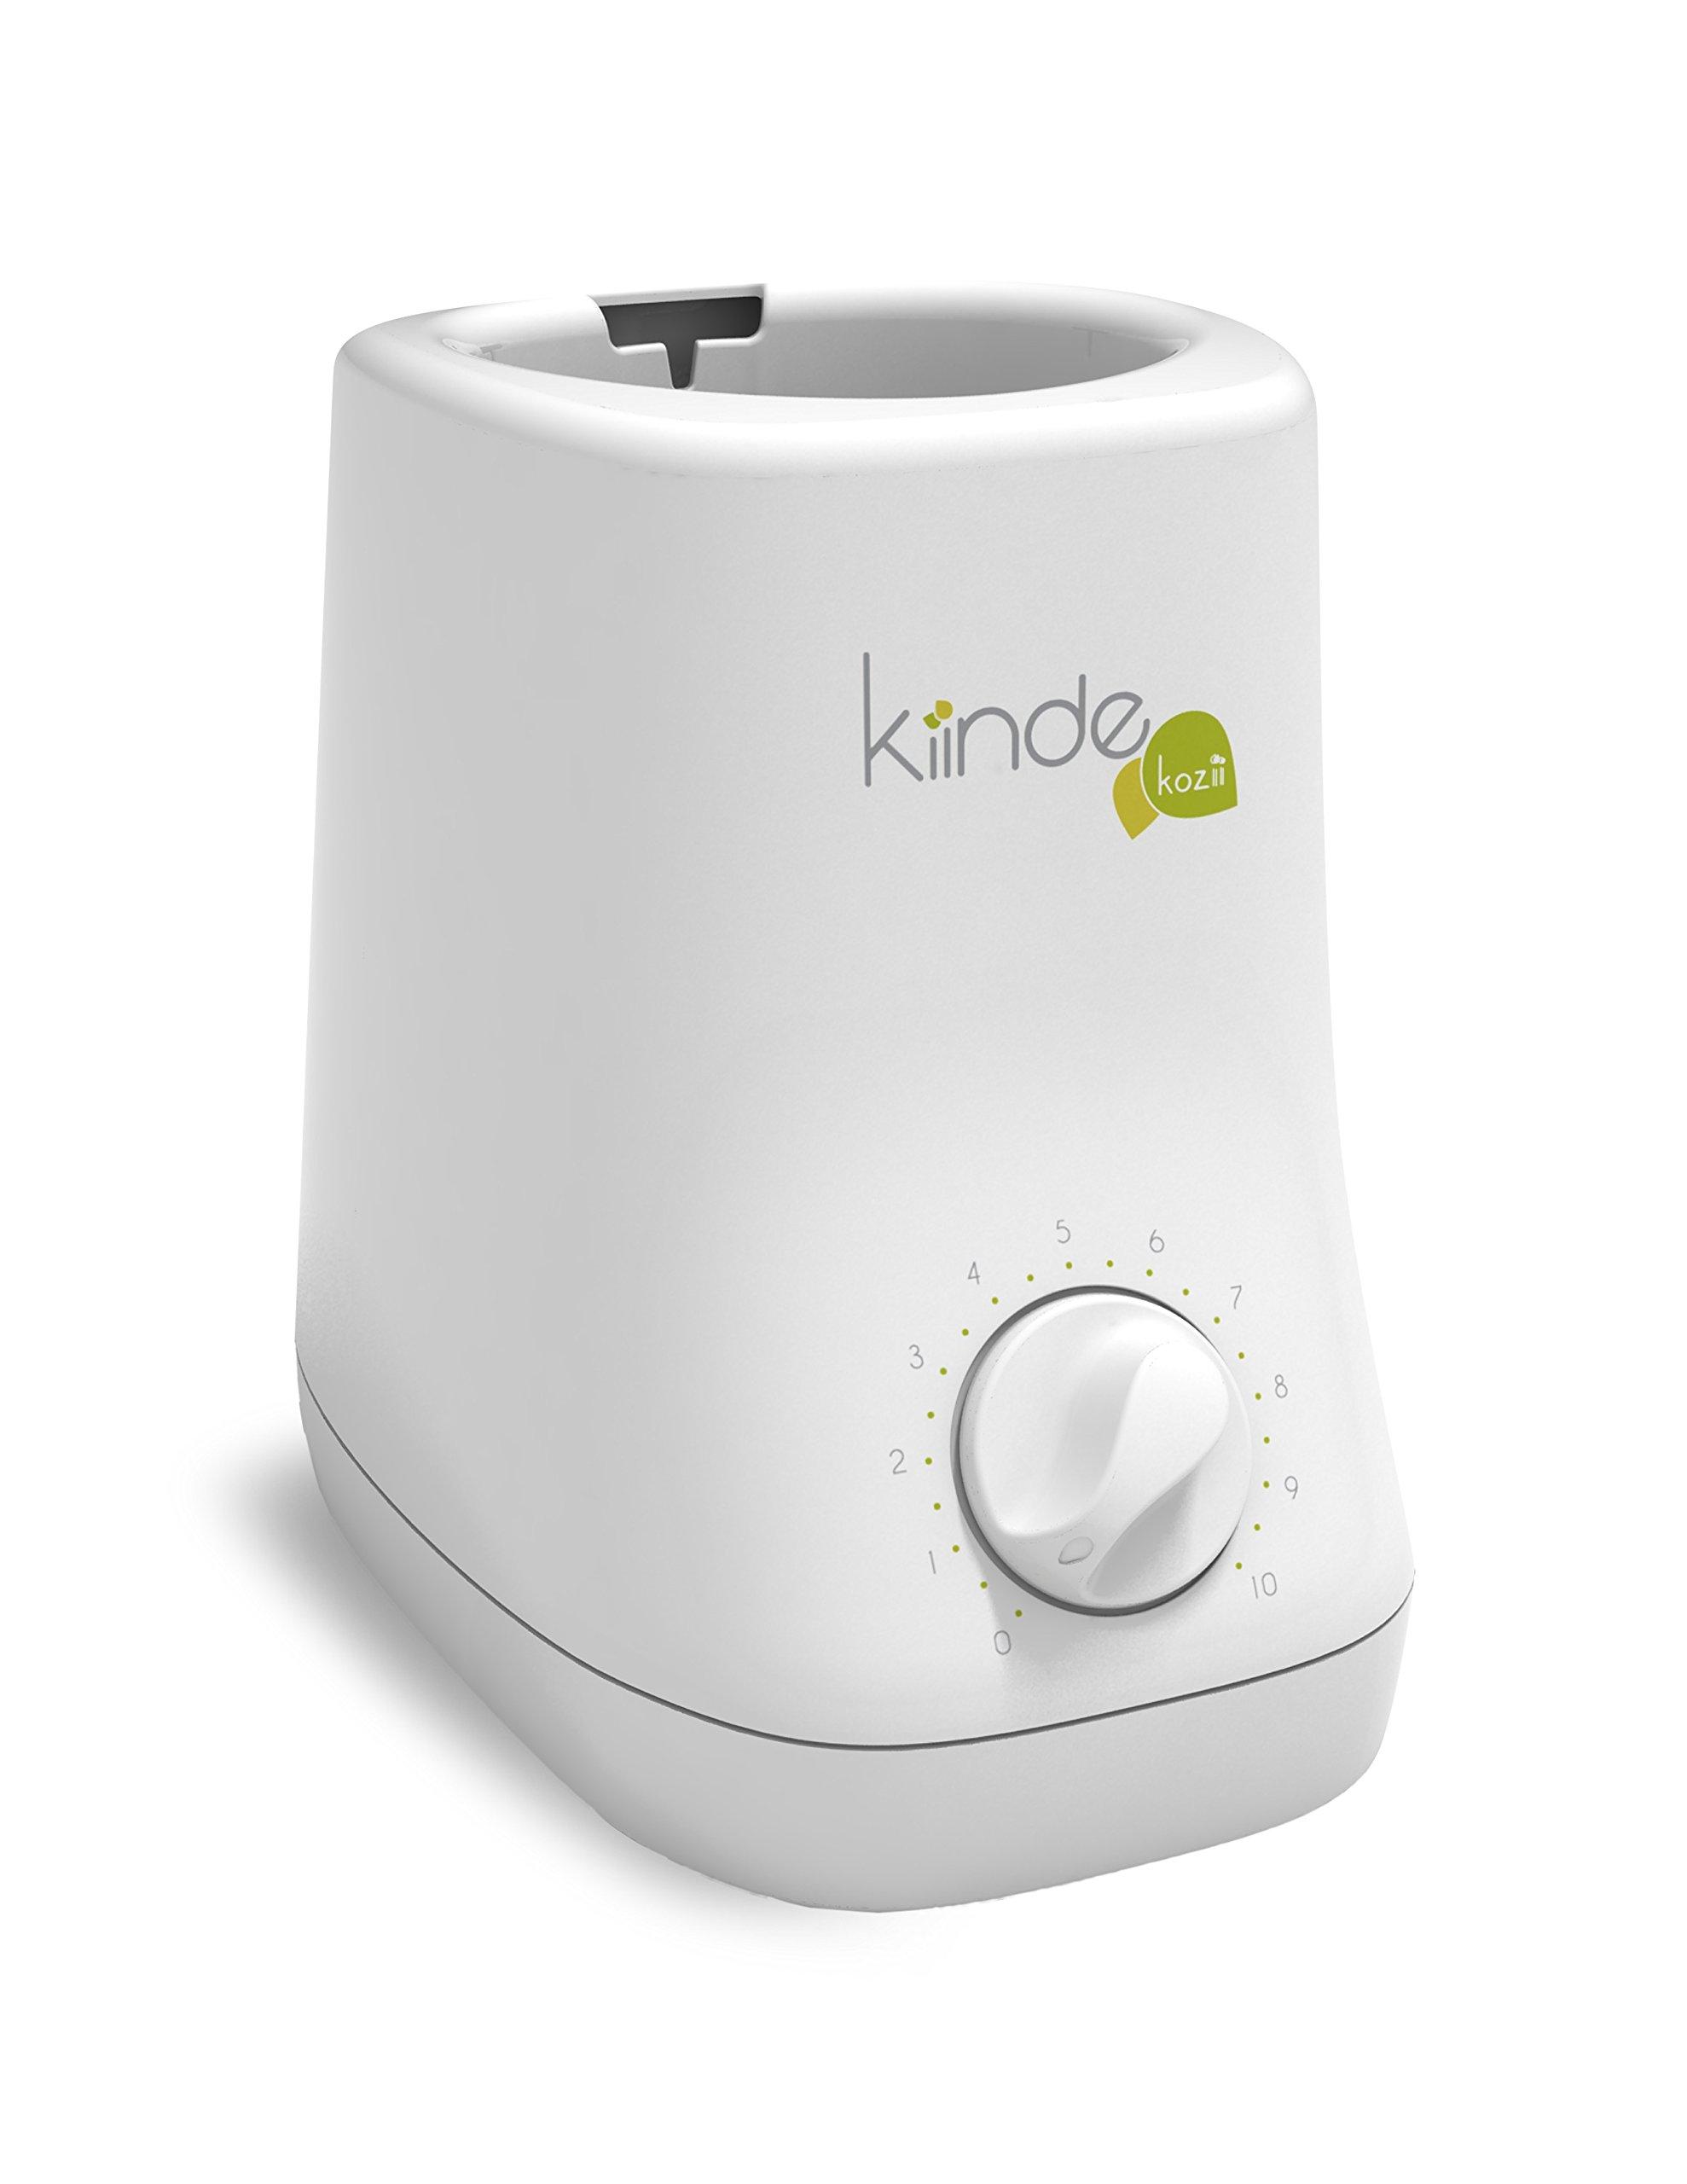 Kiinde Kozii Bottle Warmer and Breast Milk Warmer